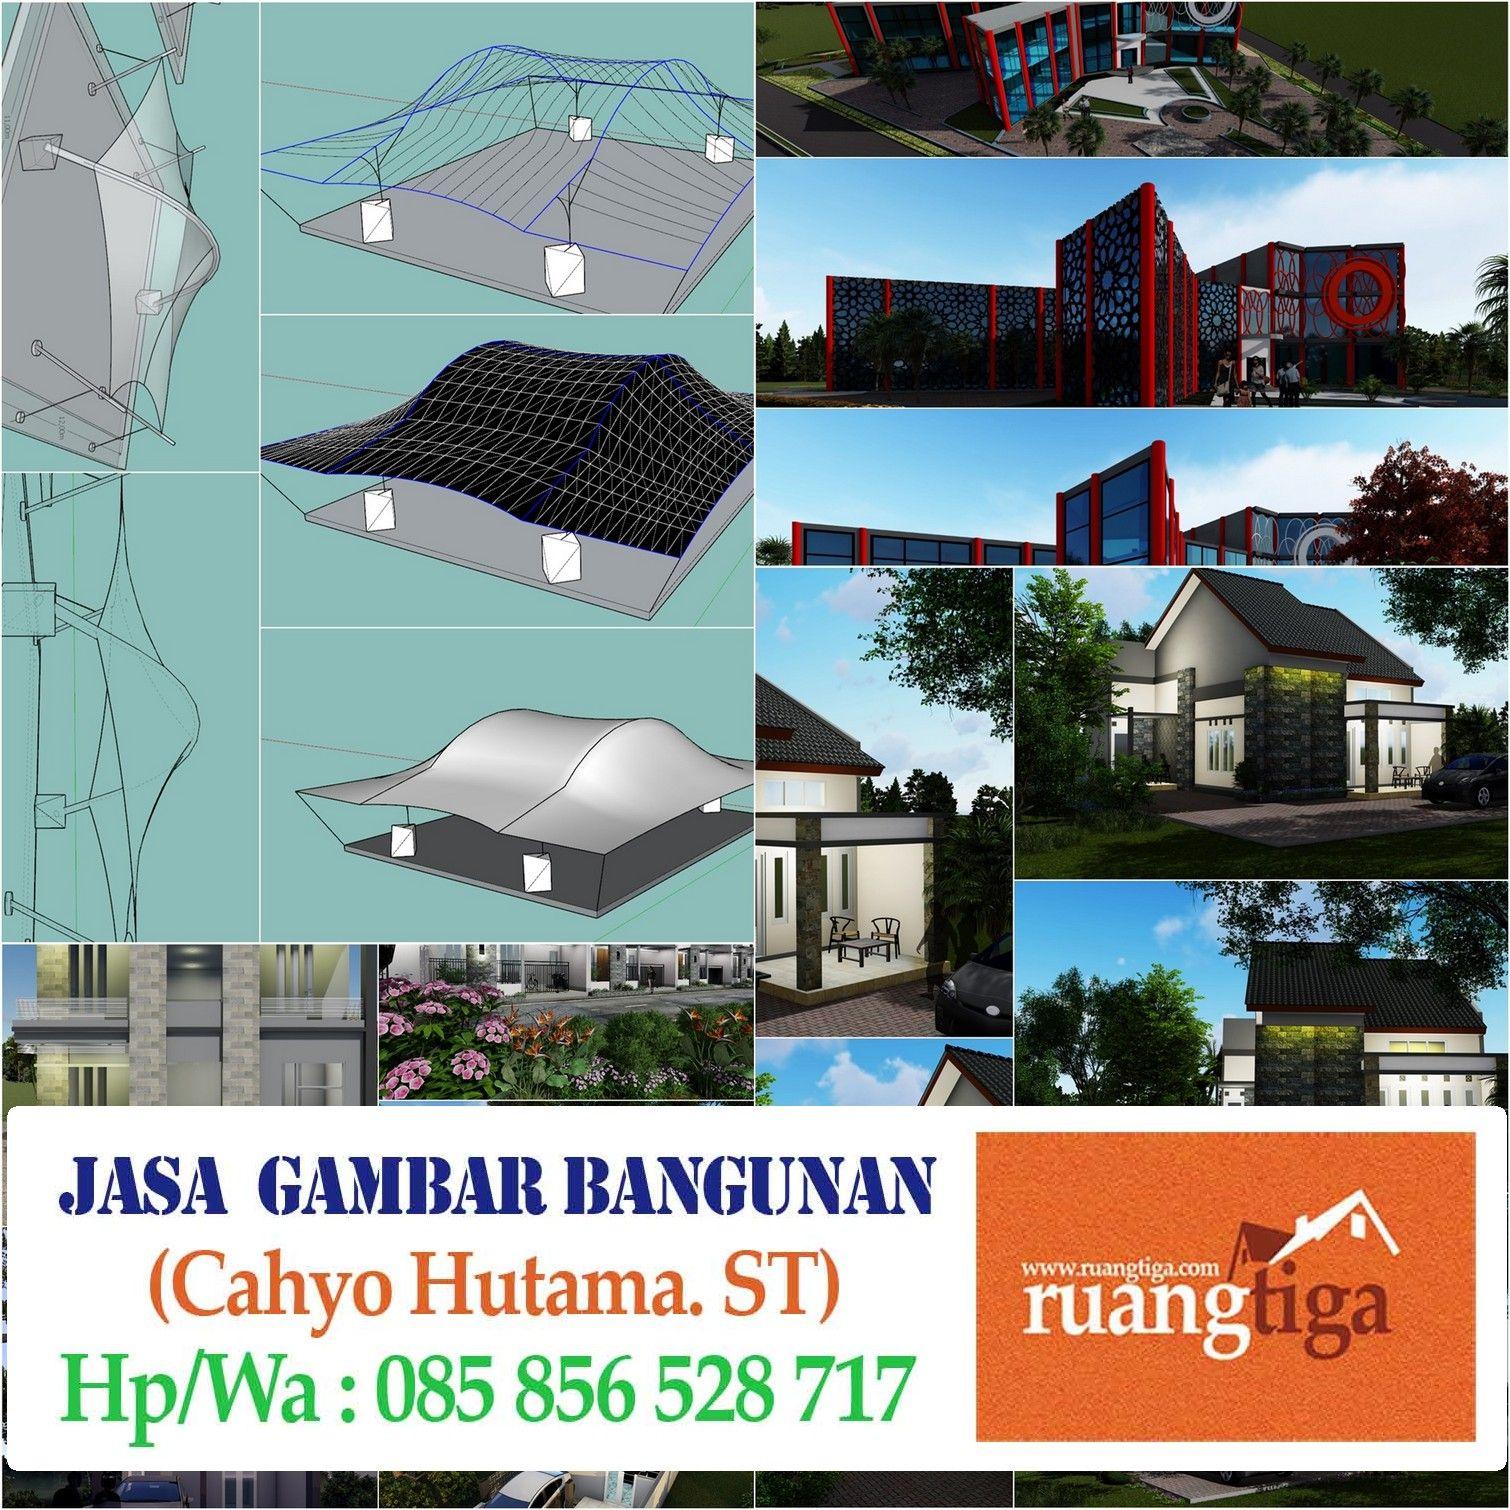 085856528717 Jasa Gambar Autocad Surabaya Jasa Render